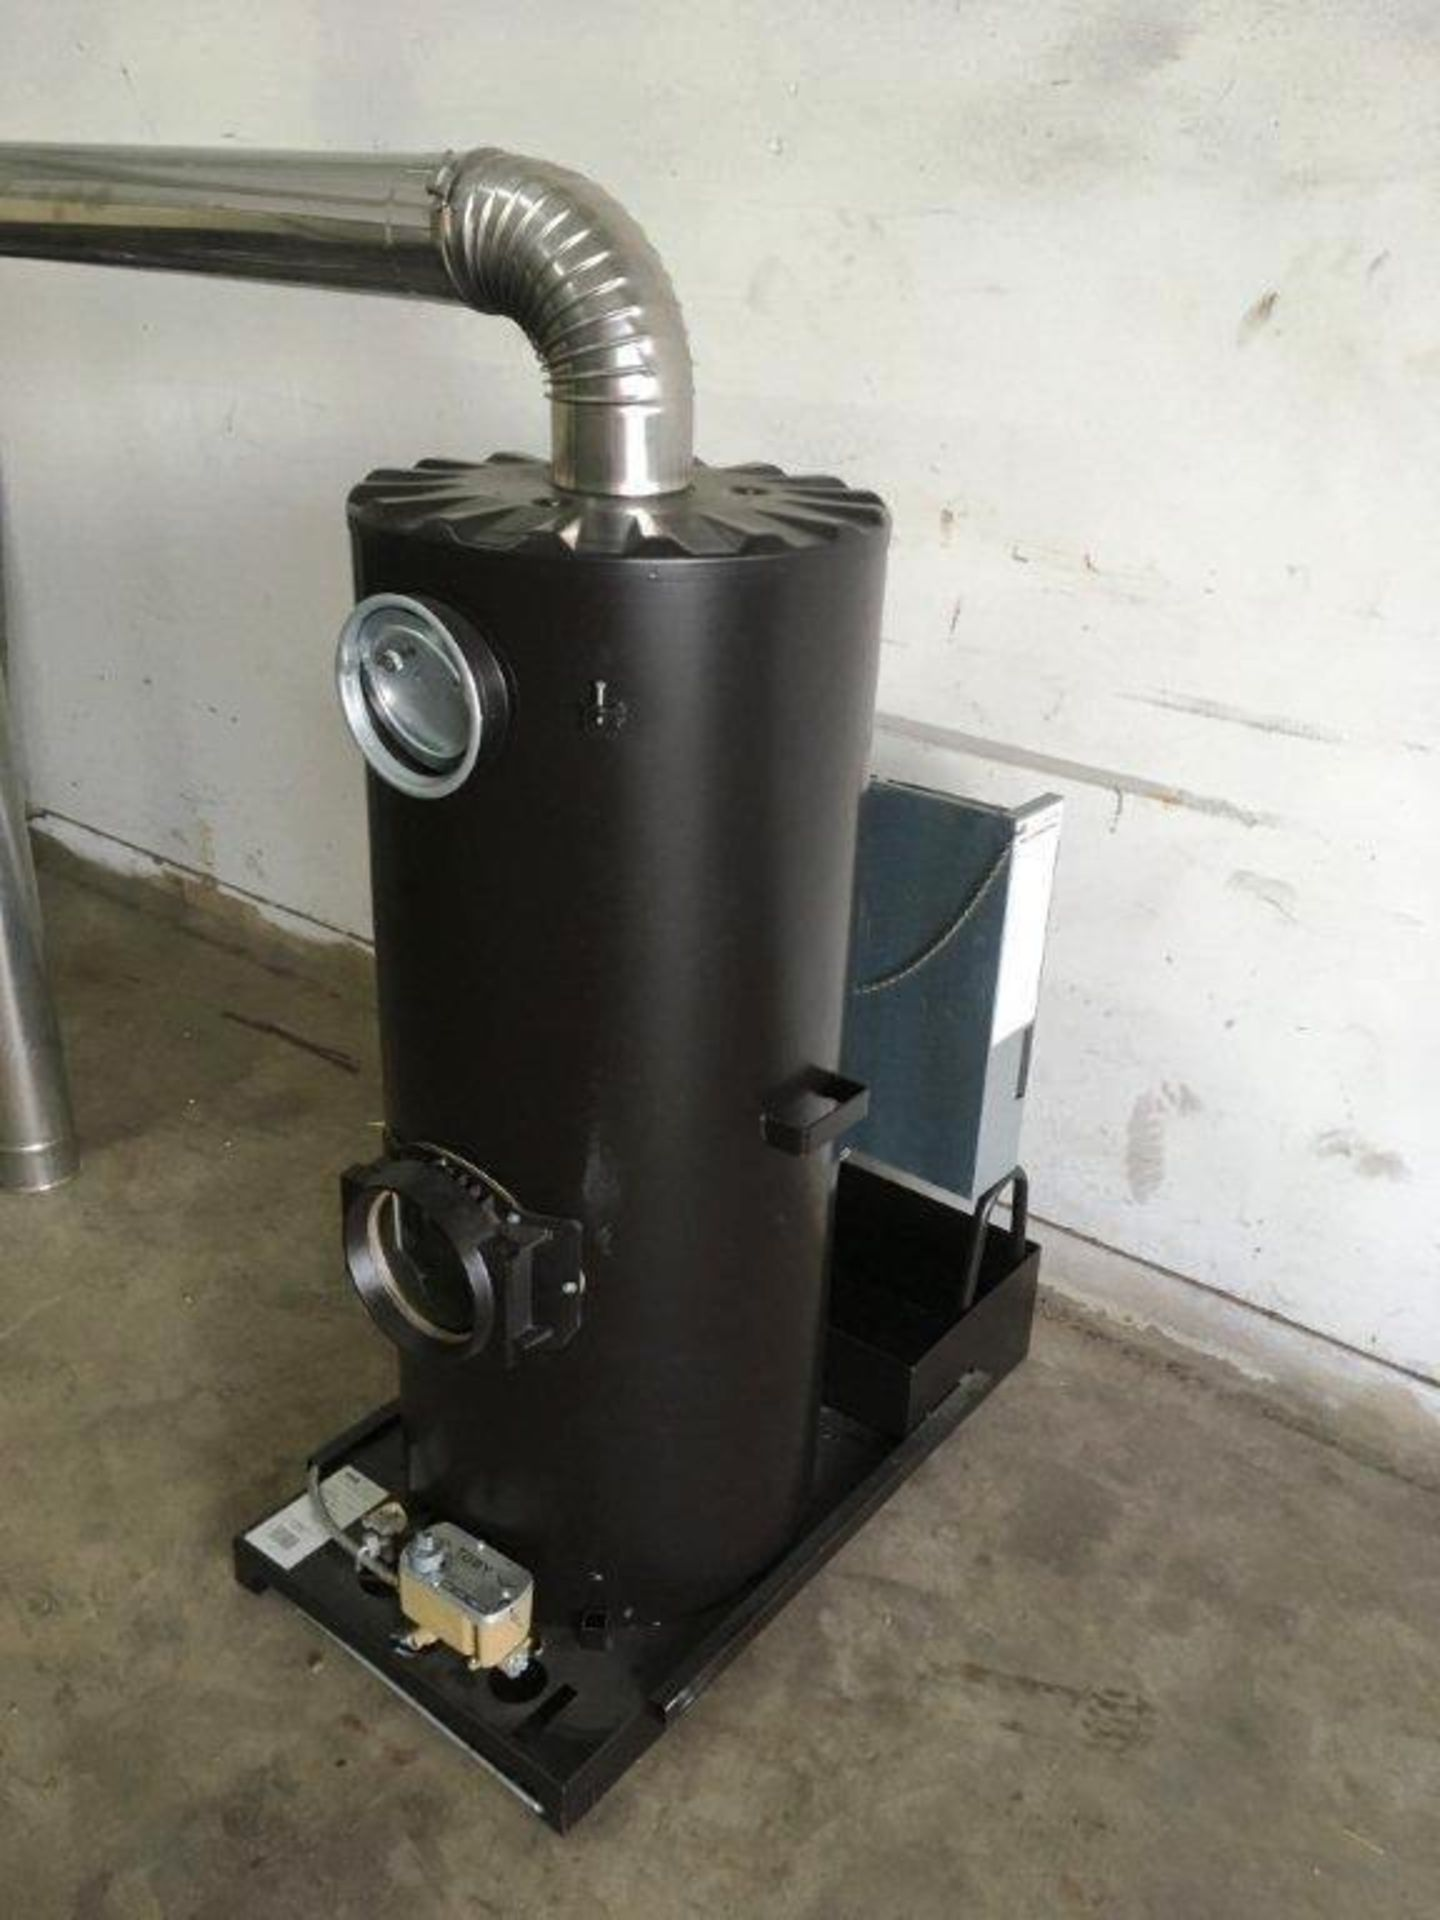 Lot 5 - Unissued Deville Campaign Multi-Fuel Heater